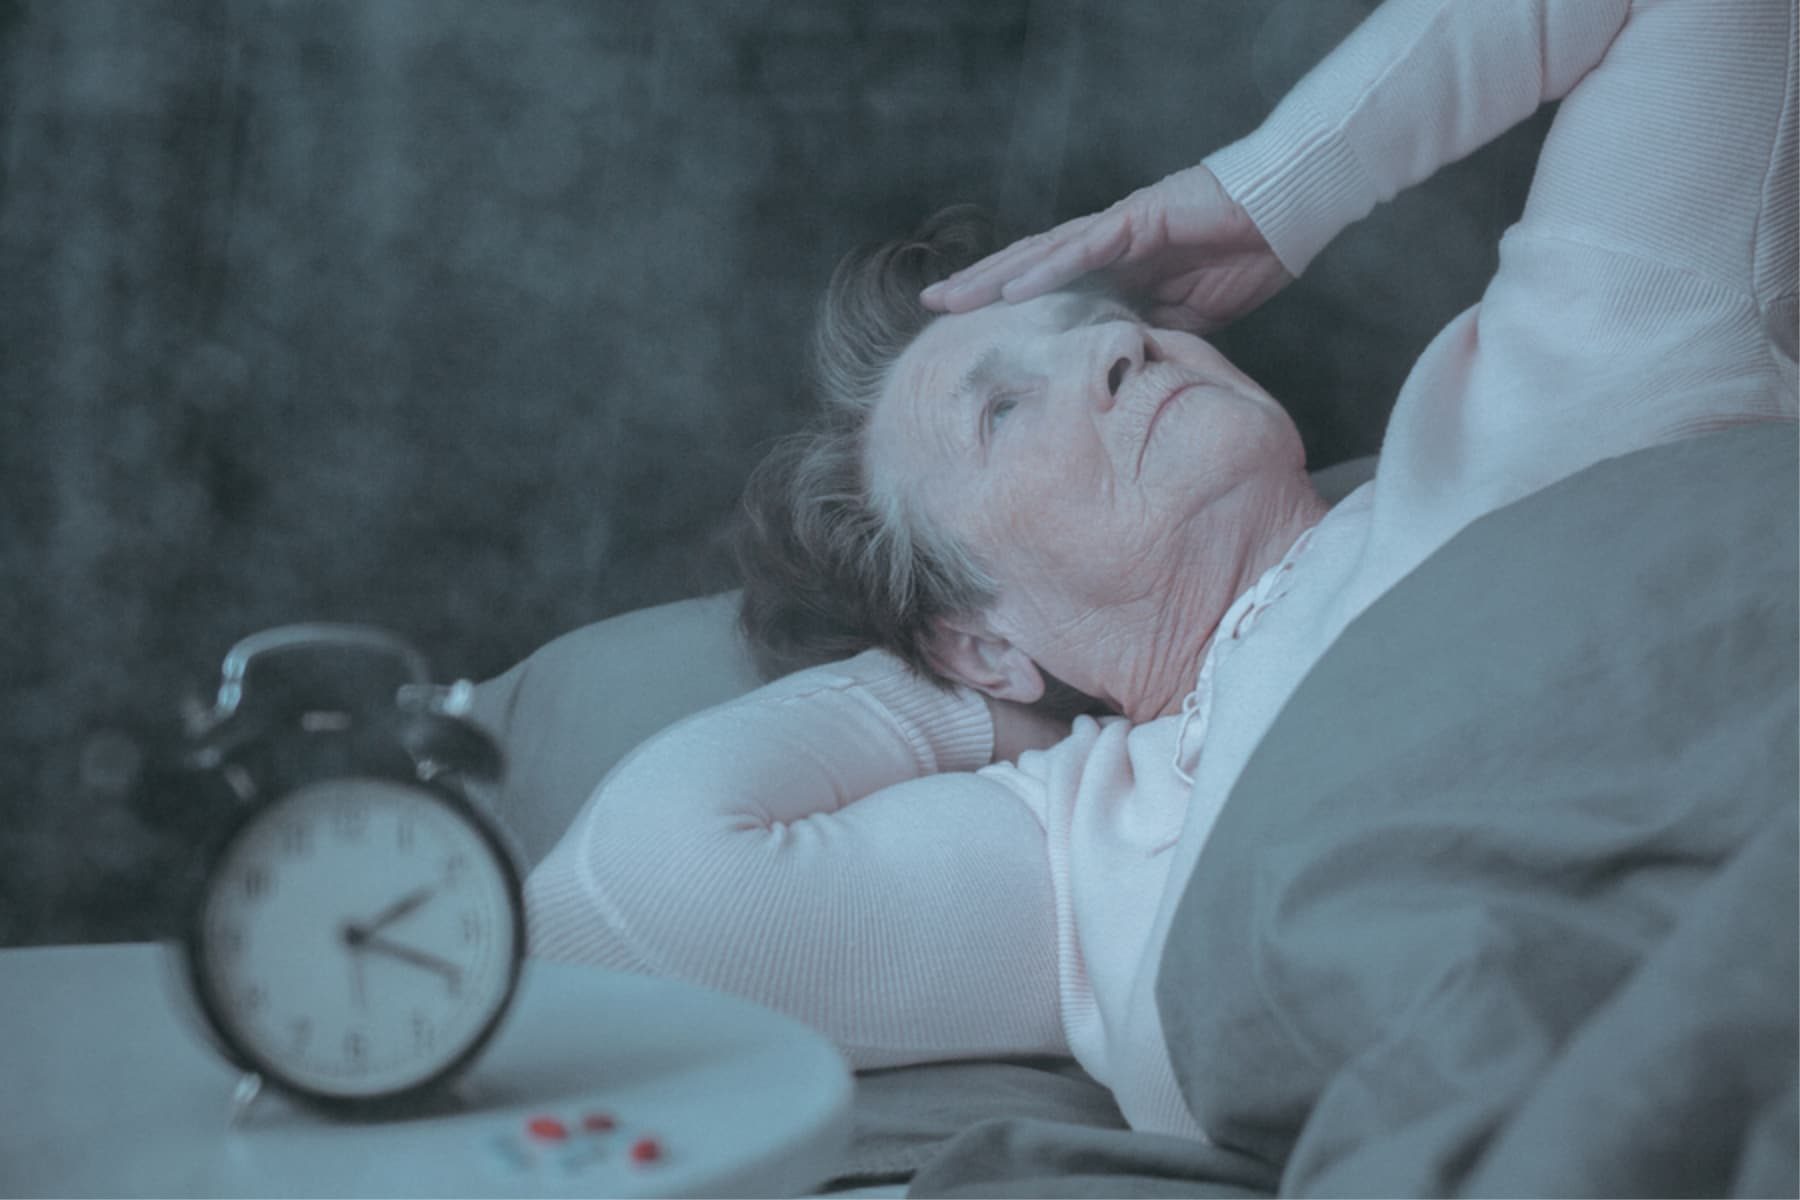 Senior Care in Chandler AZ: Sleep Deprivation